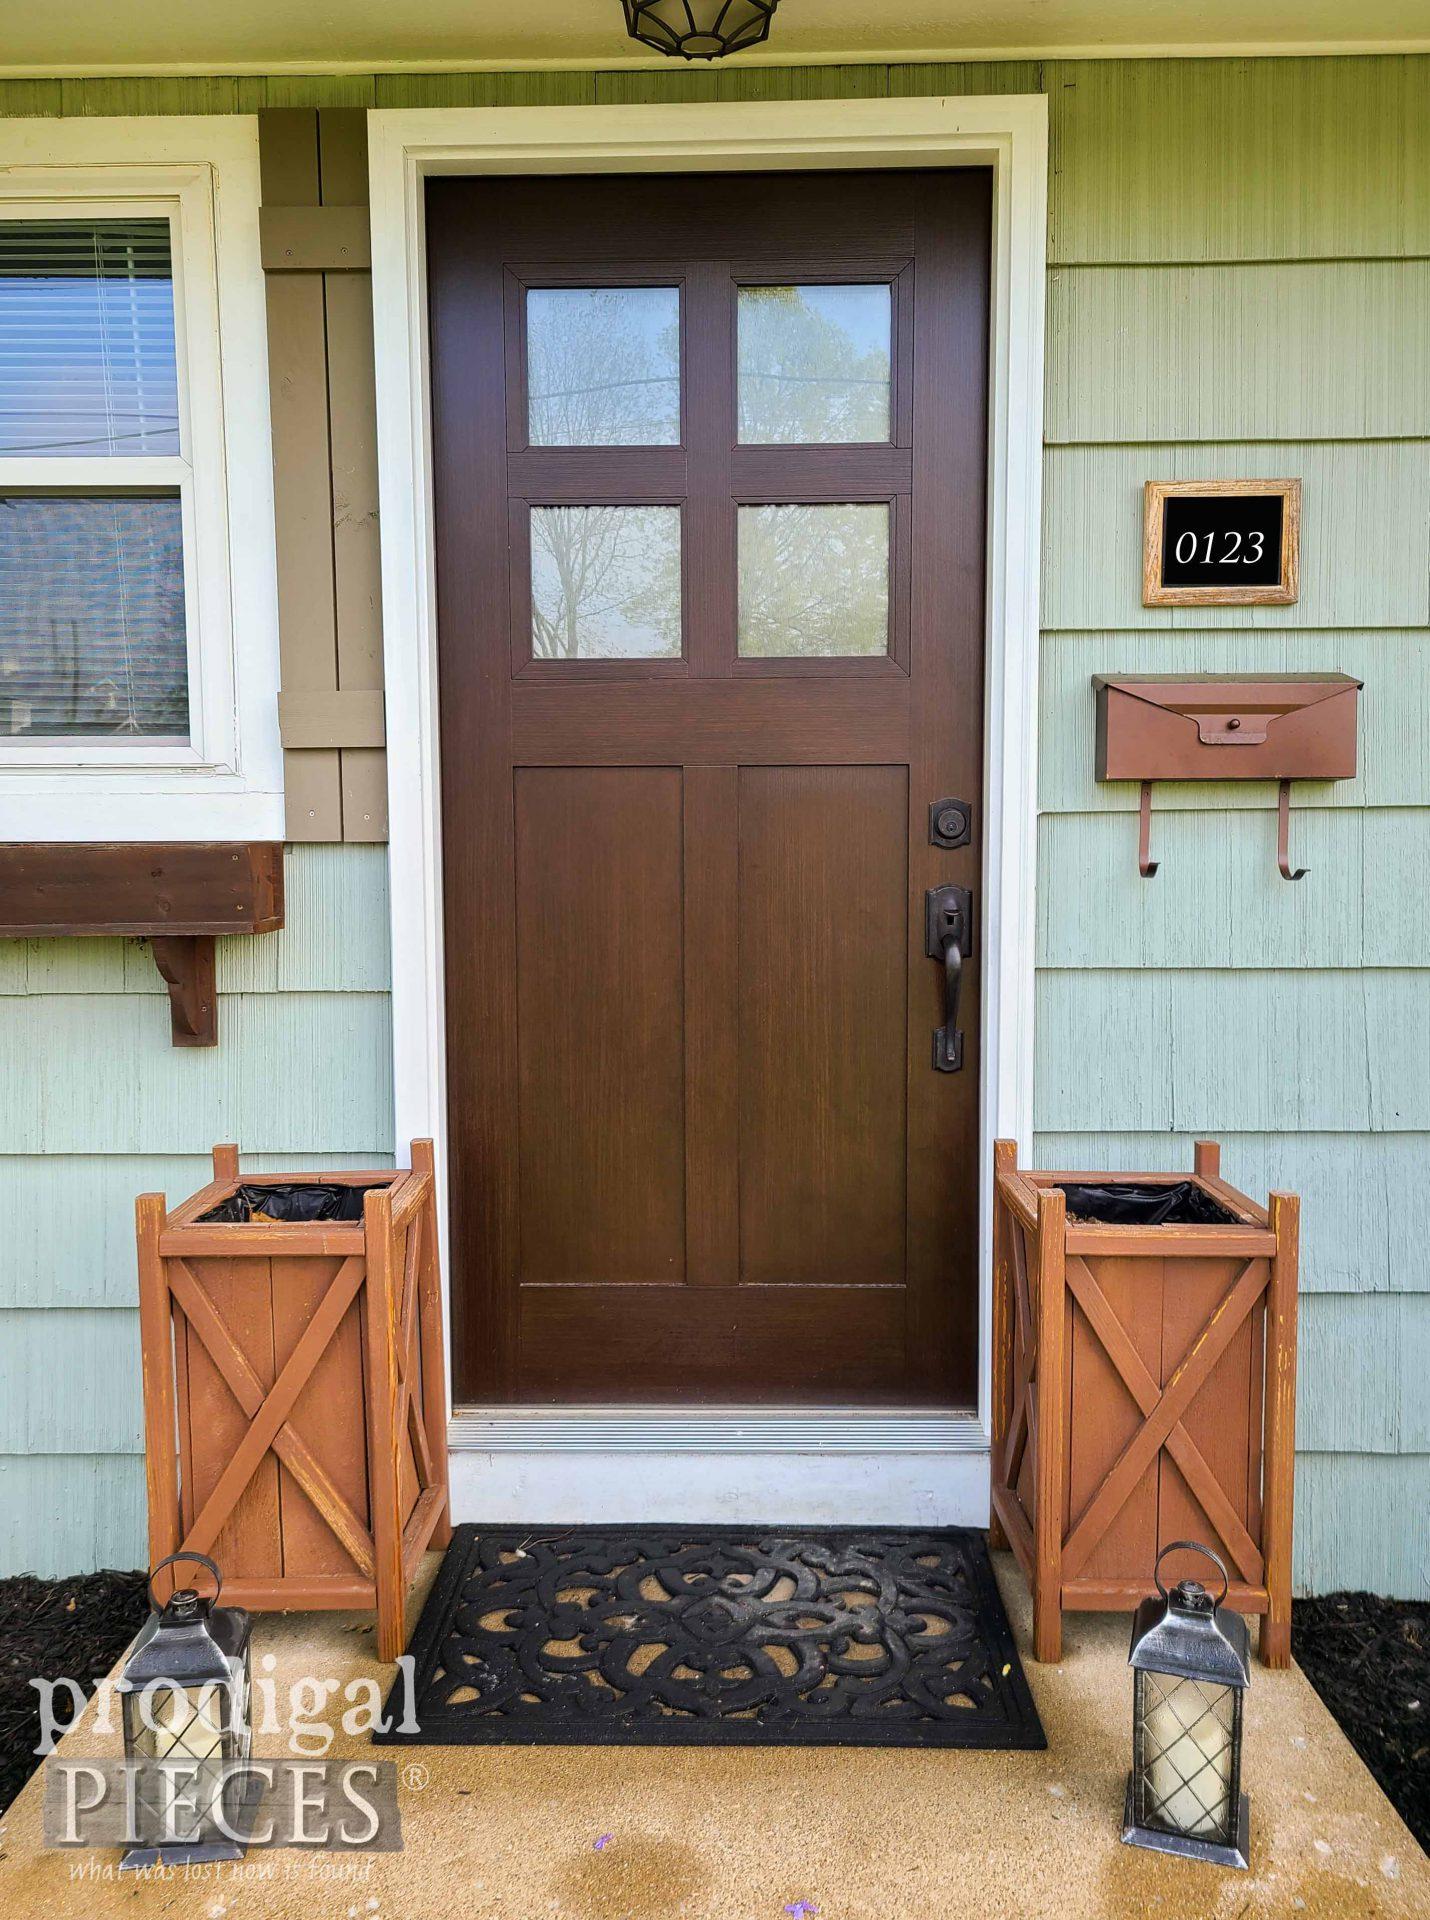 Prodigal Pieces Front Door Before | prodigalpieces.com #prodigalpieces